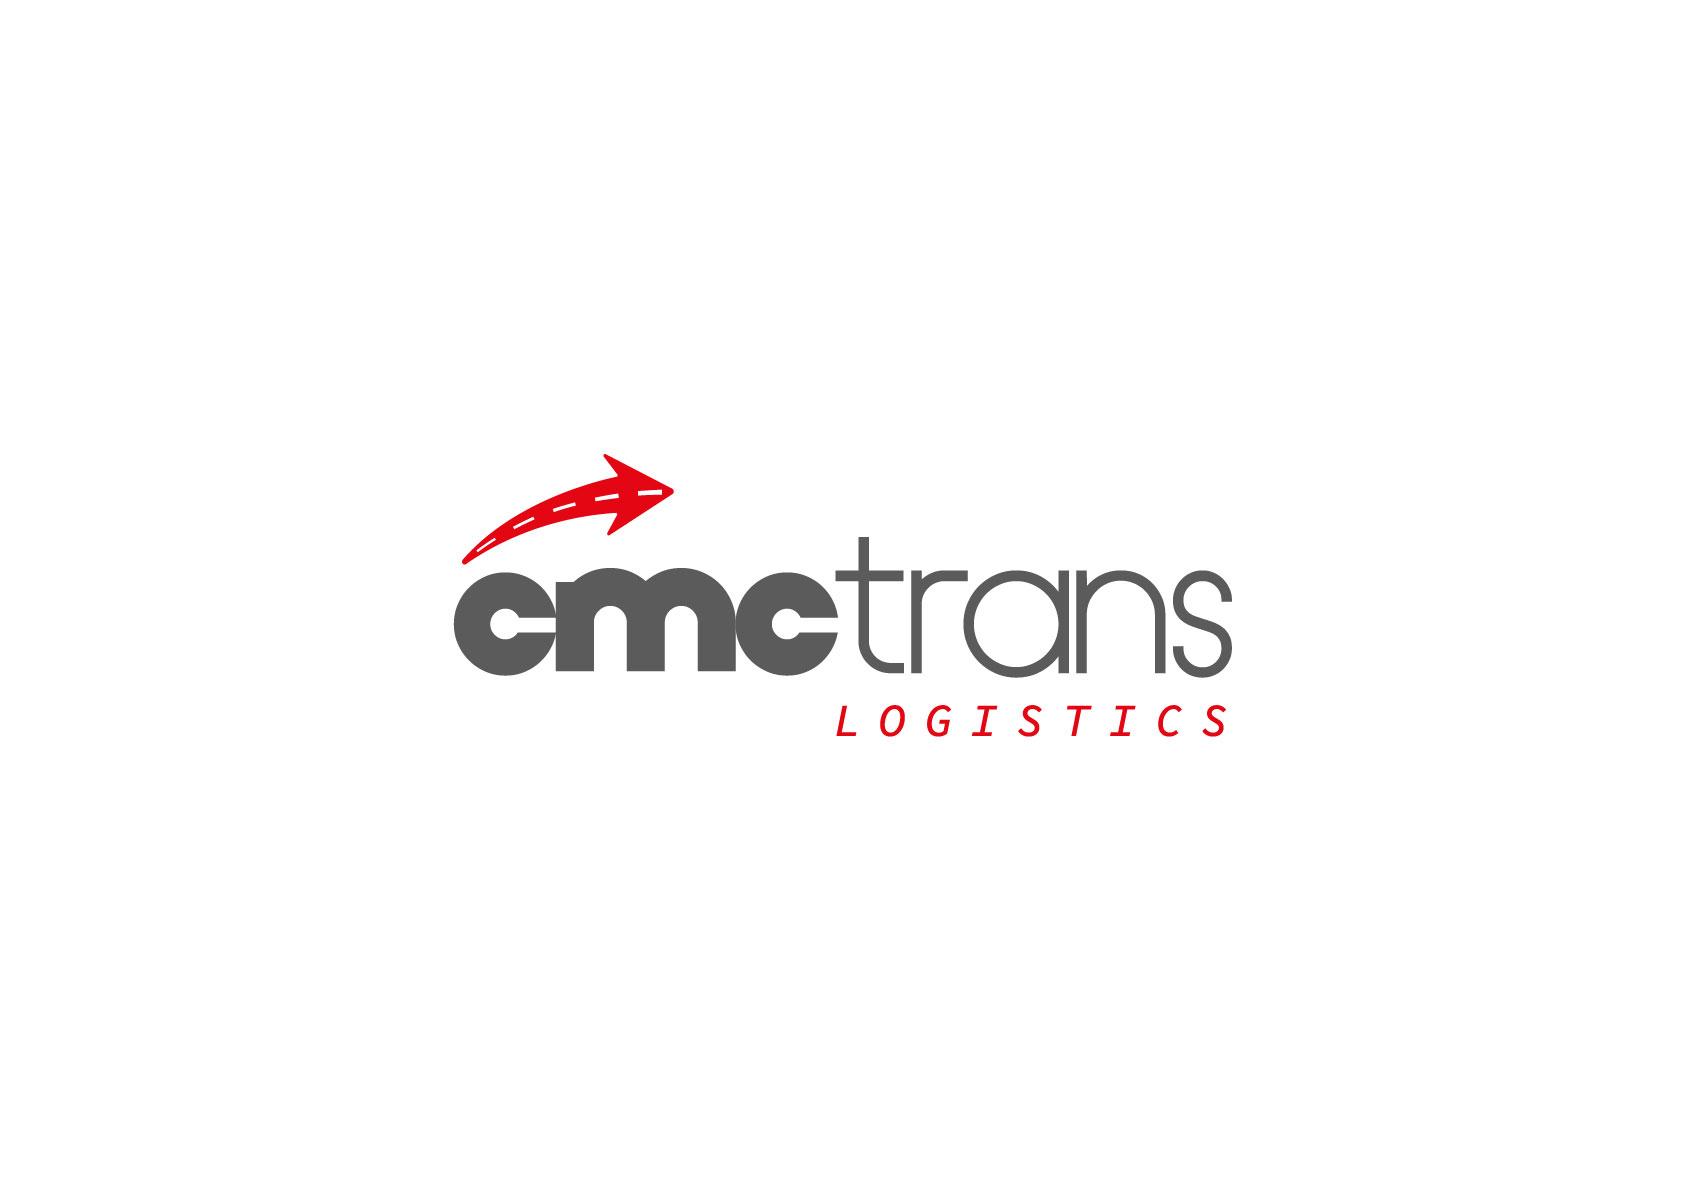 cmctrans-logo-01